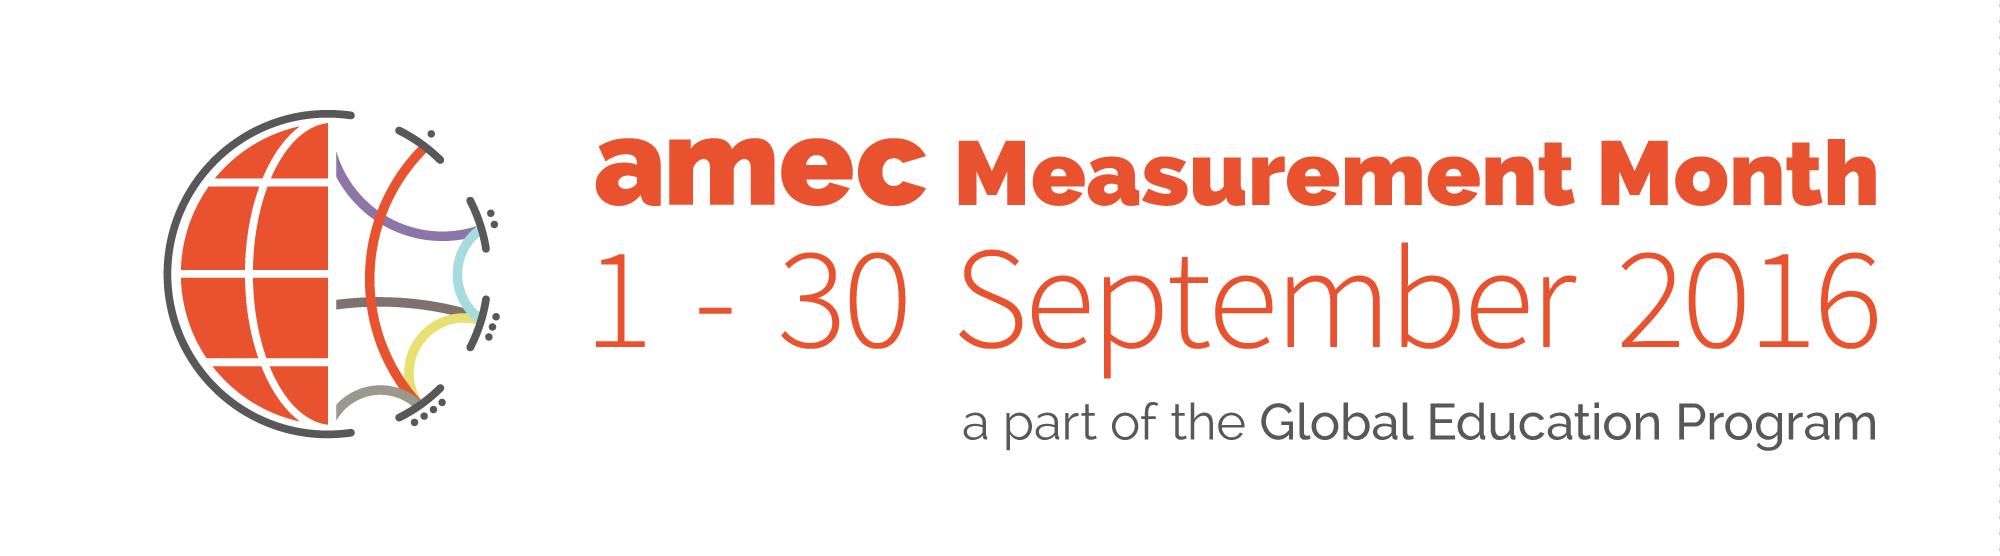 AMEC Measurement Month